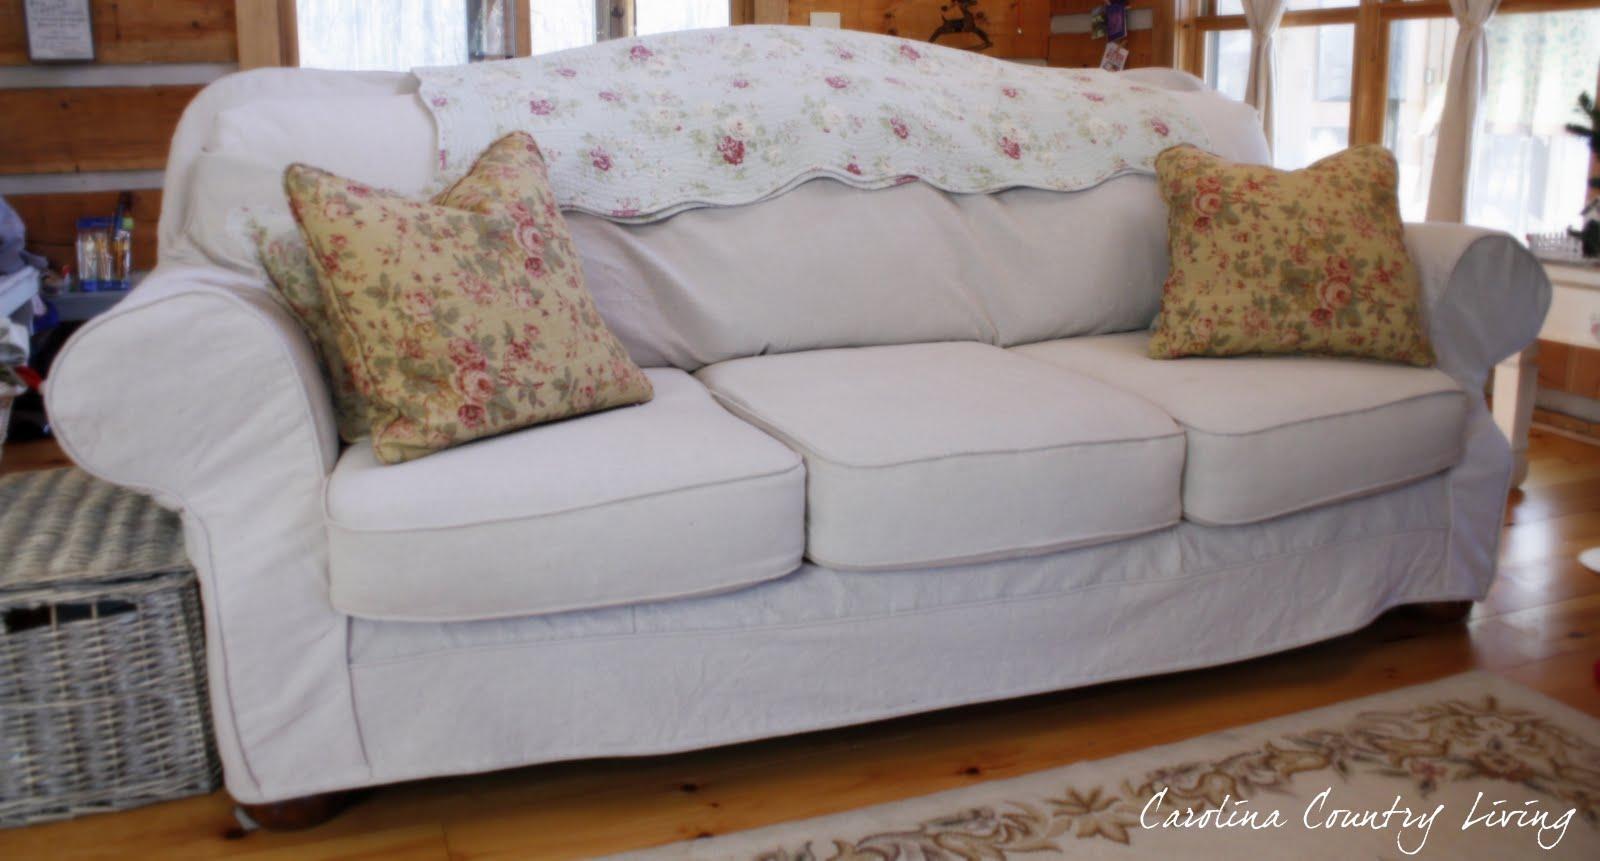 Carolina Country Living: Drop Cloth Sofa Slipcover With Regard To Camel Back Sofa Slipcovers (Image 5 of 20)